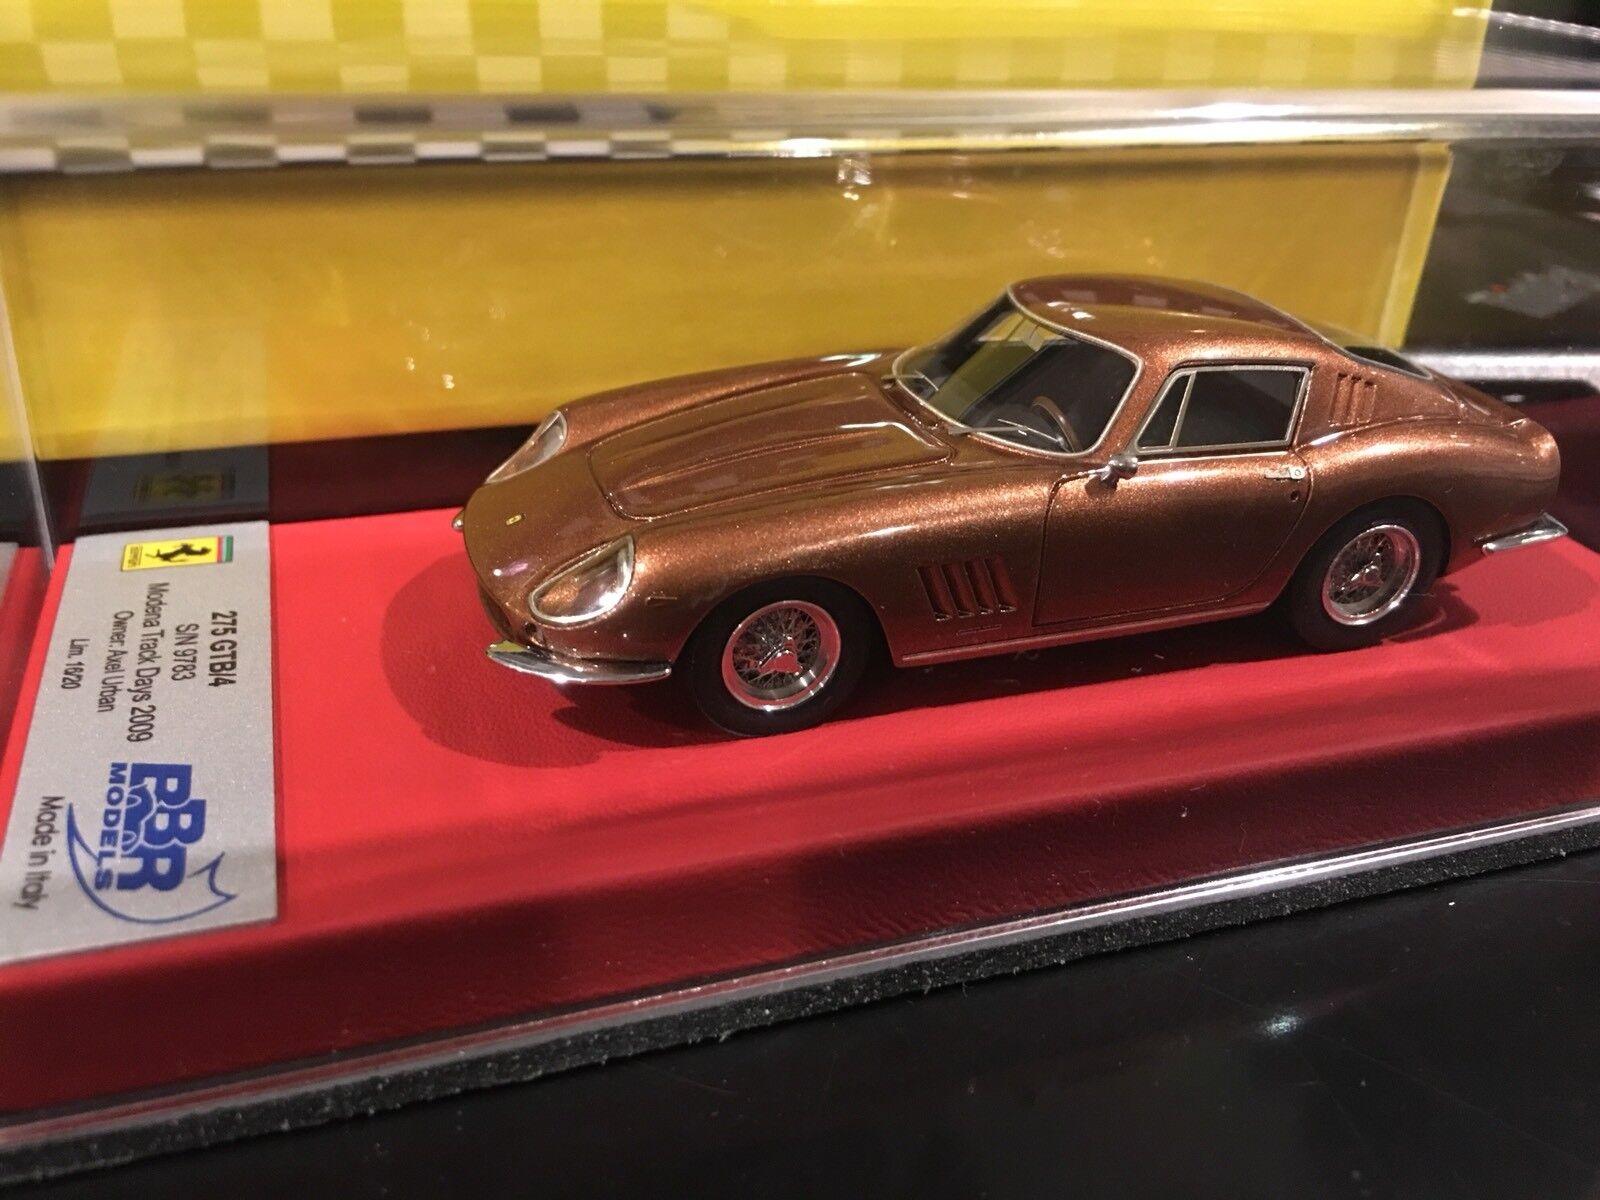 1 43 Rgm Bbr Ferrari 275 Gtb 4 Modena Piste Jours S N 9783   16 20 Neuf Vendu